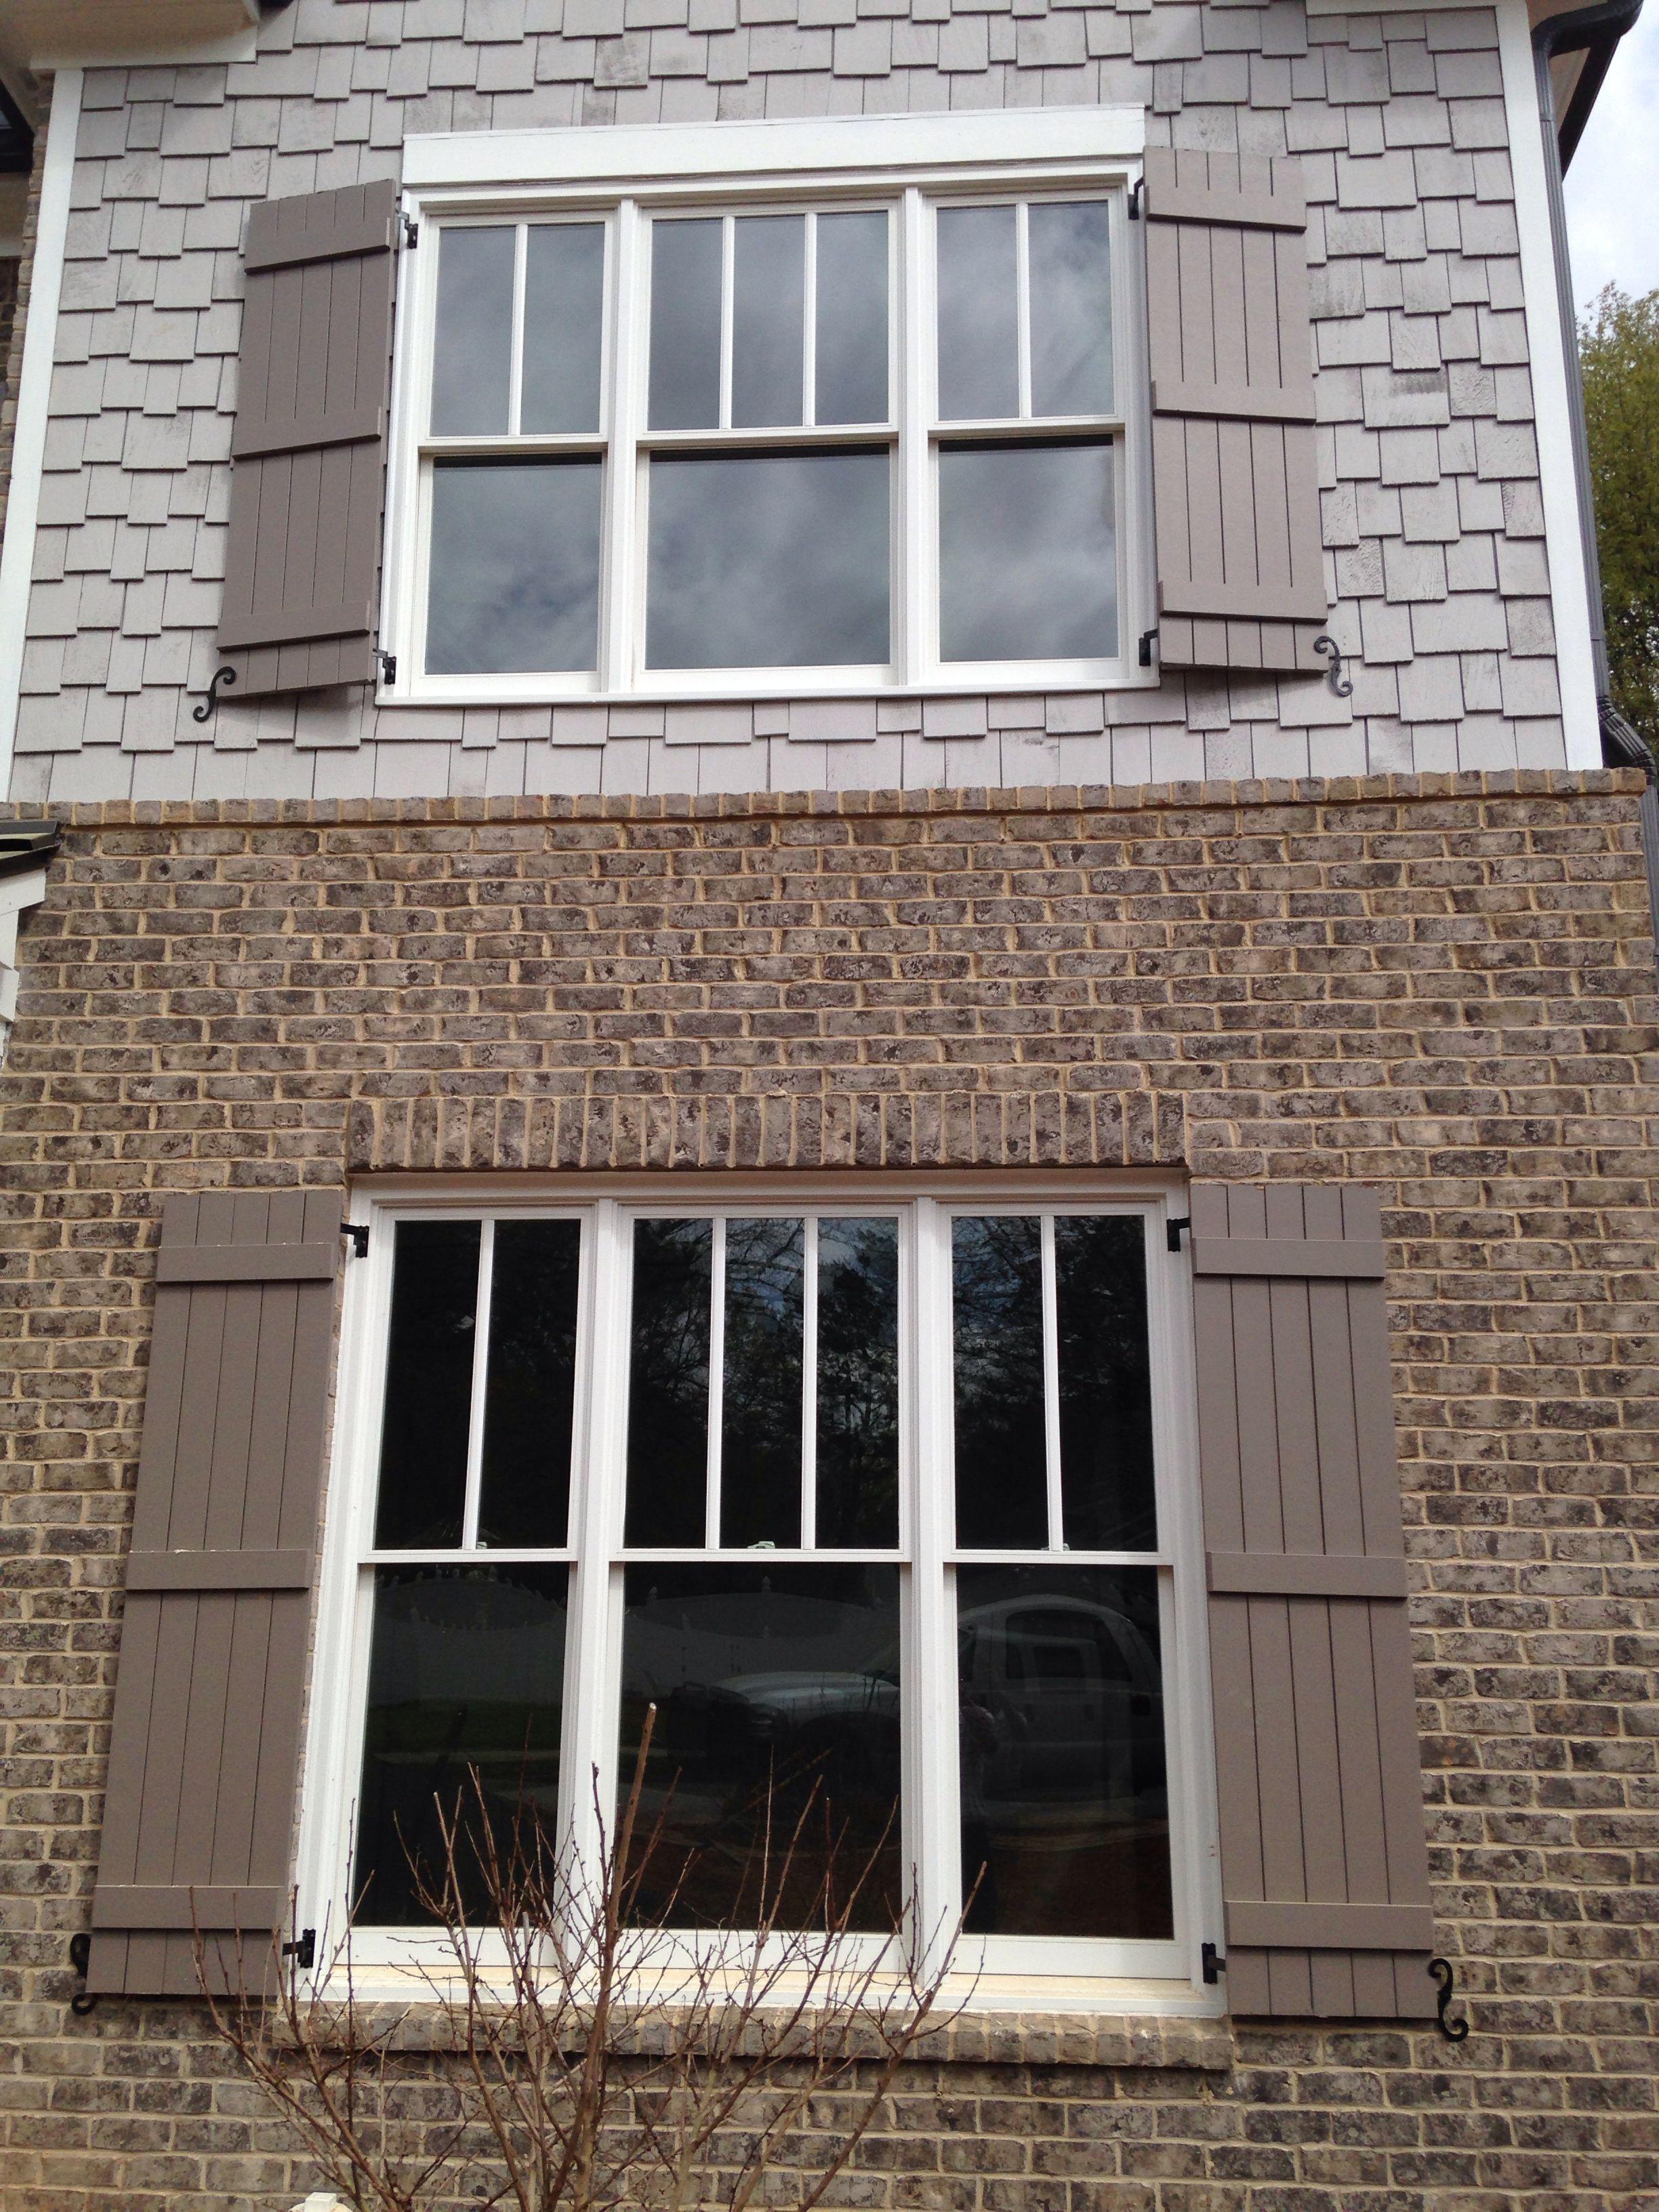 Everest Gray Brick Anti Buff Mortar 2014 Hot Bricks In